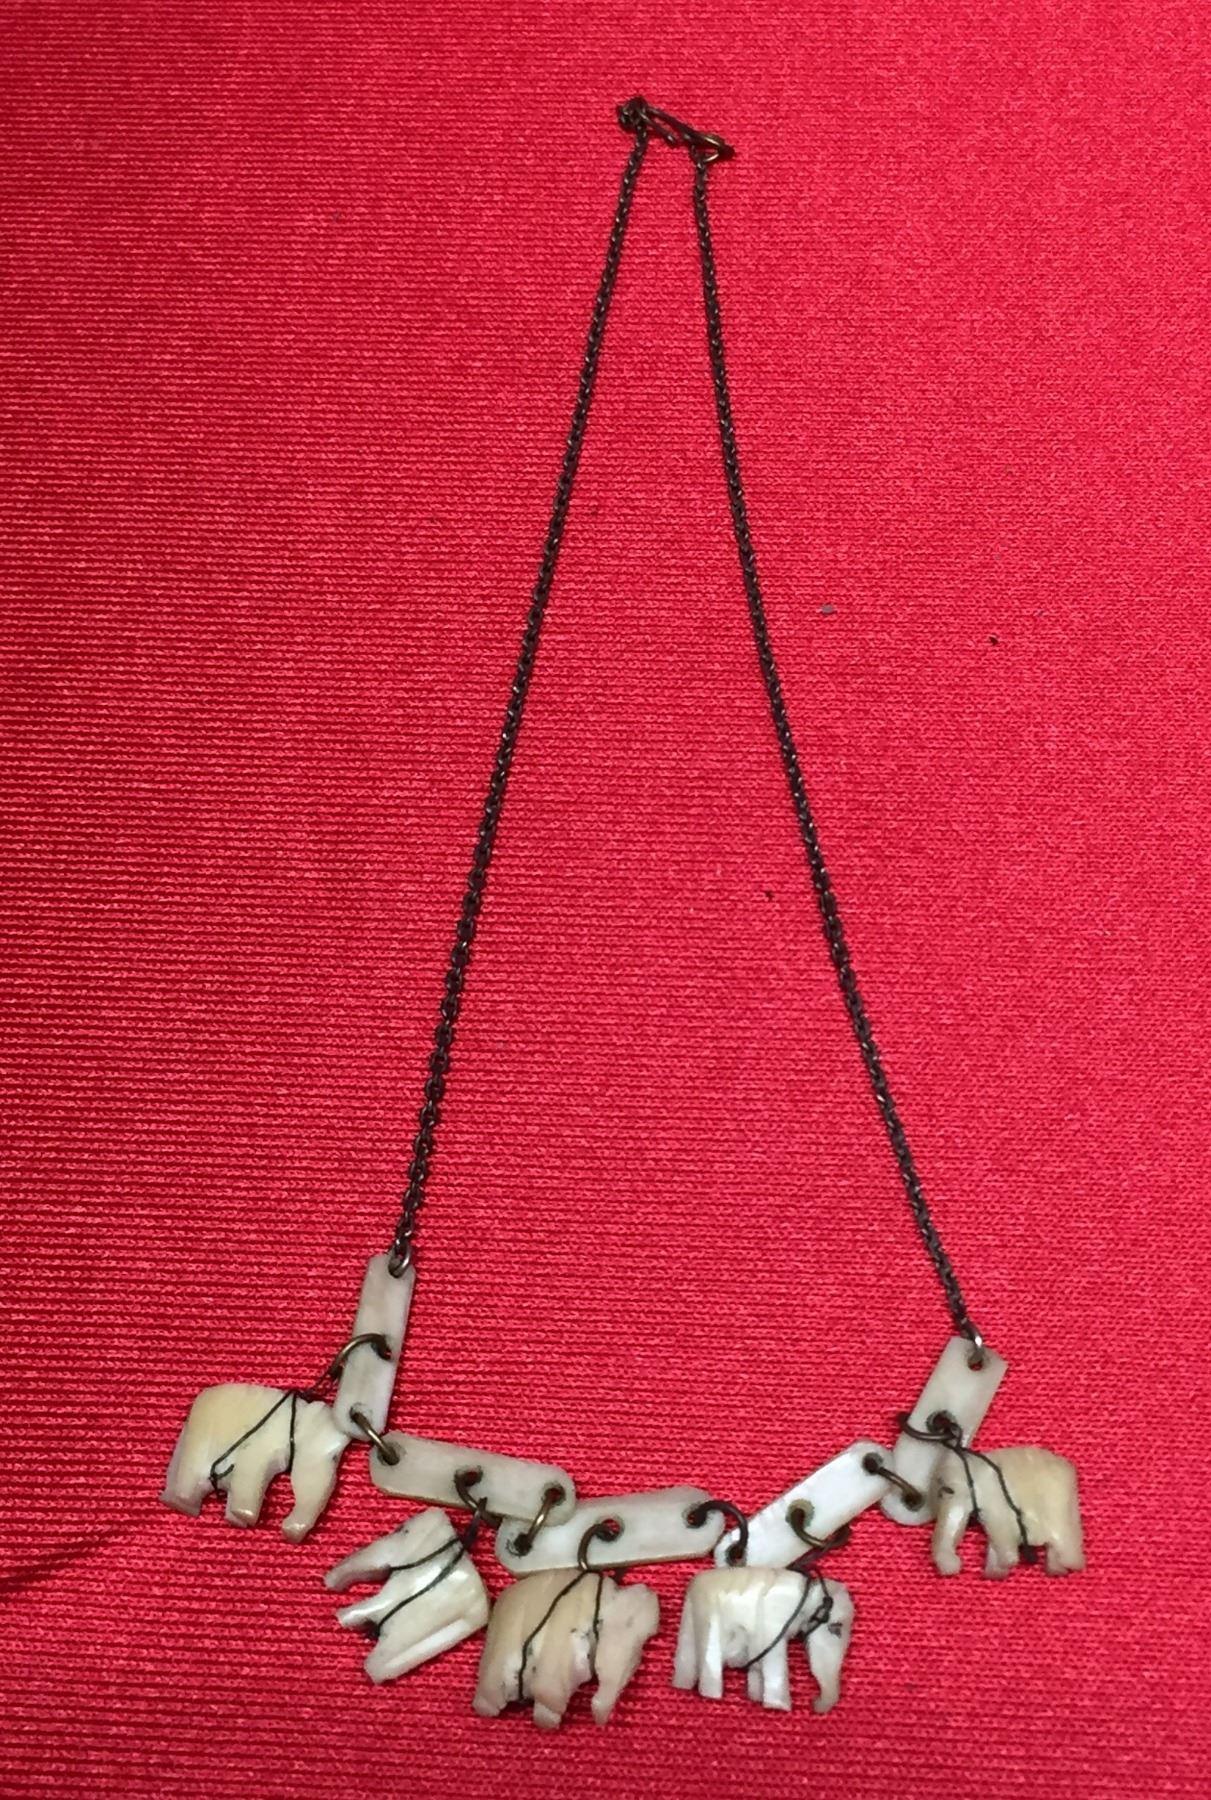 Antique Bone Carved Elephant Necklace